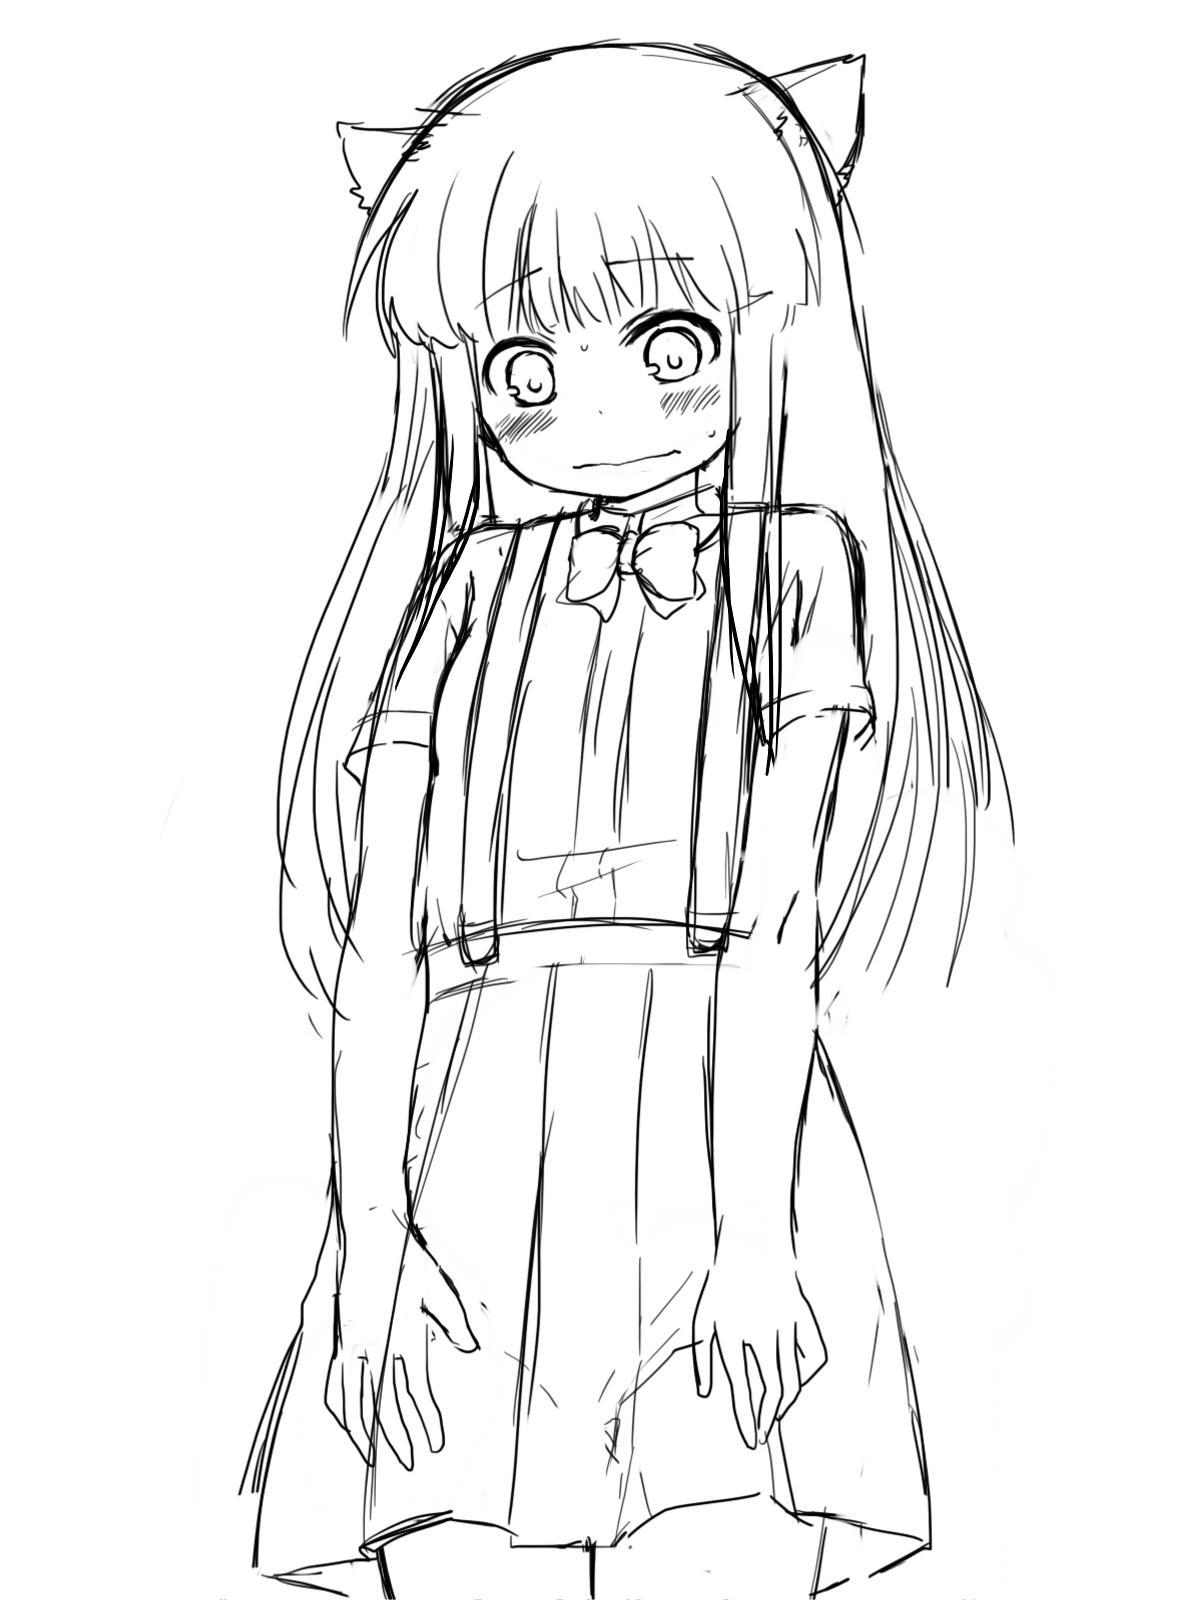 Rika-chan to Cosplay Ecchi! 24